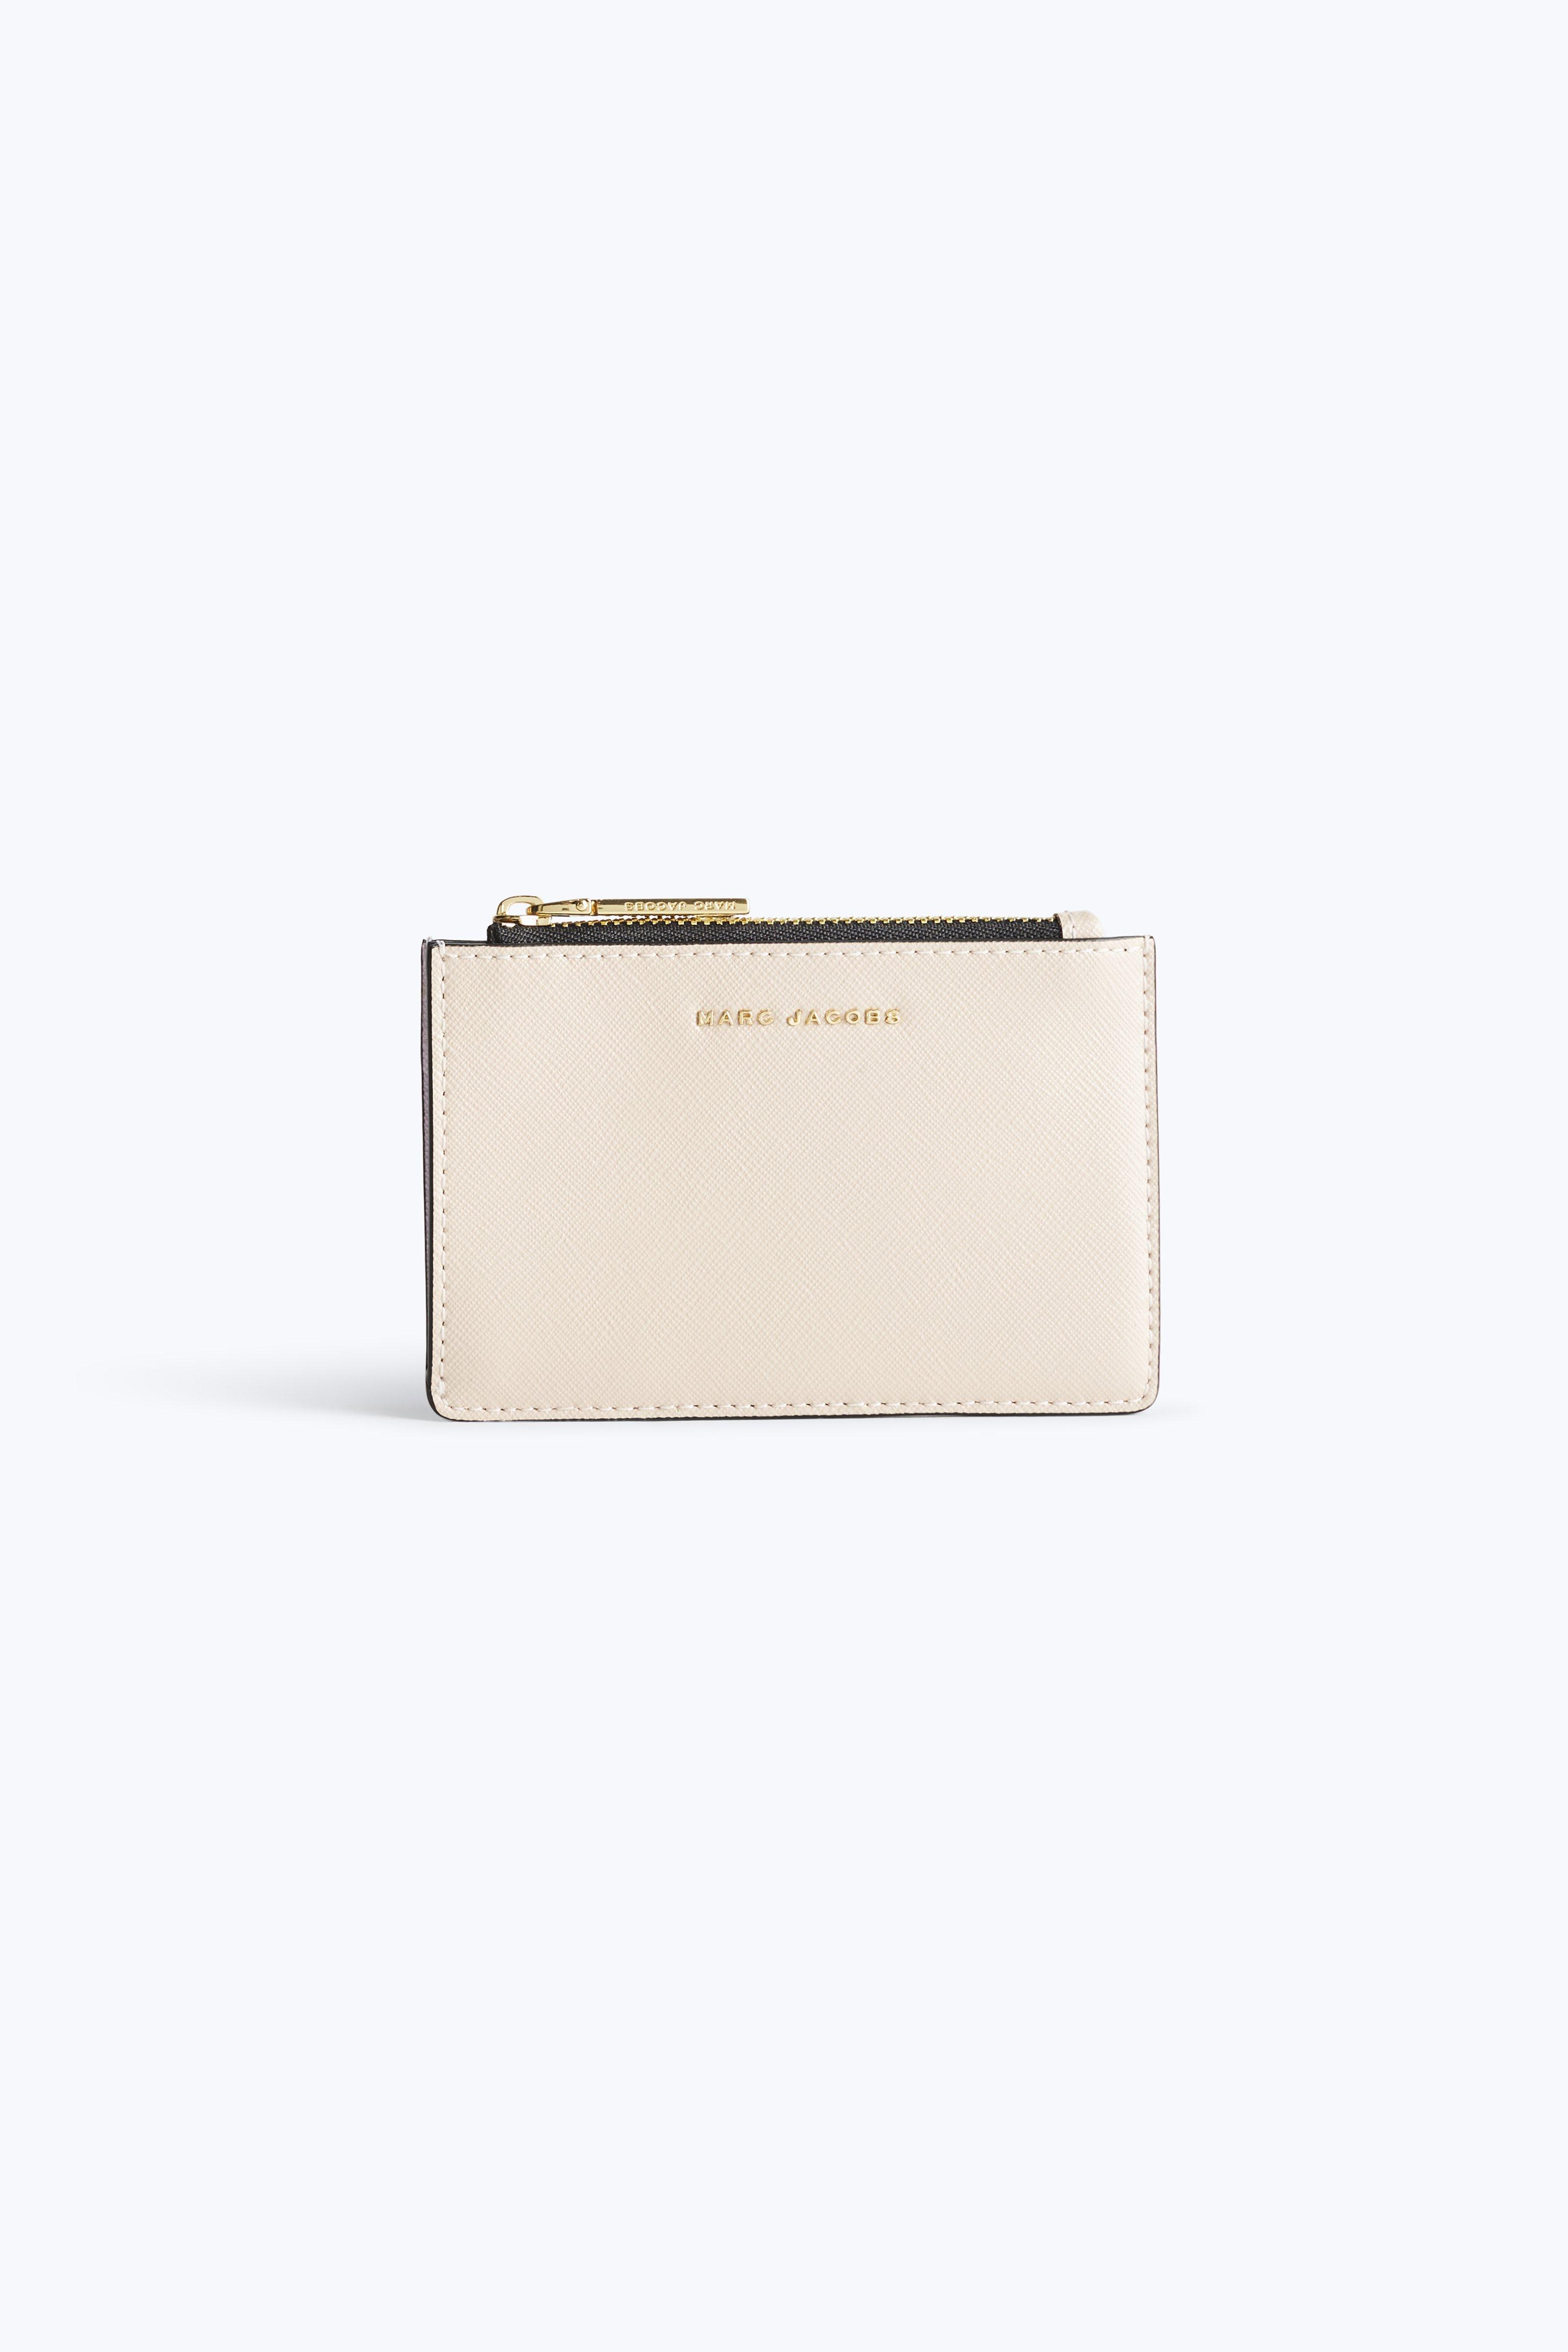 Marc Jacobs Saffiano Top Zip Multi Wallet In Pale Pink